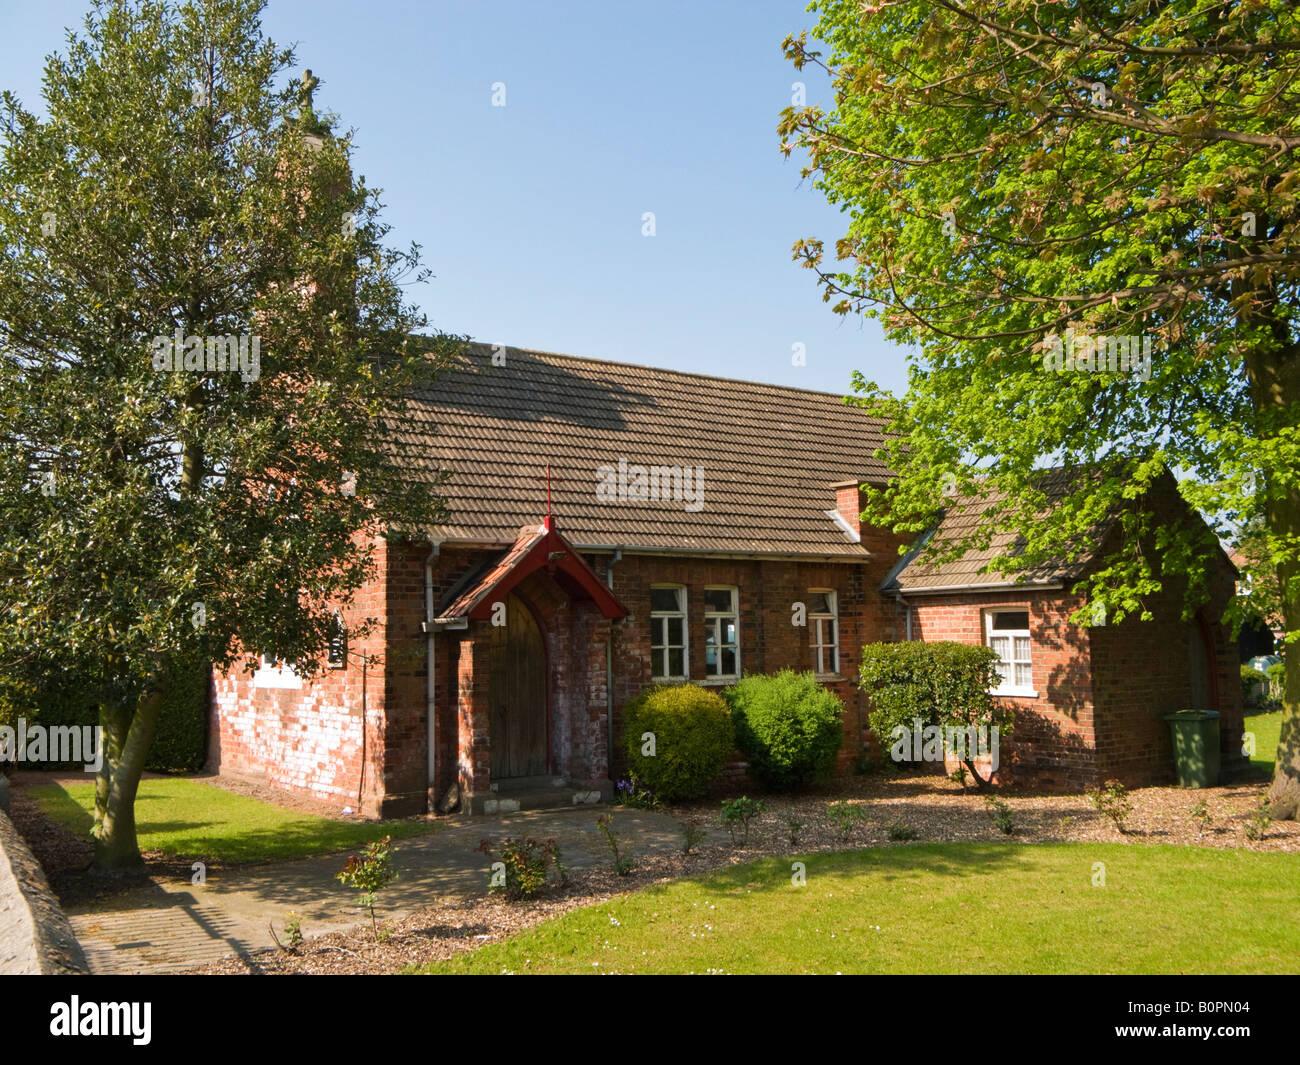 St Joseph and St Dymphna Catholic Church, Luddington, Isle of Axholme, North Lincolnshire, England UK - Stock Image